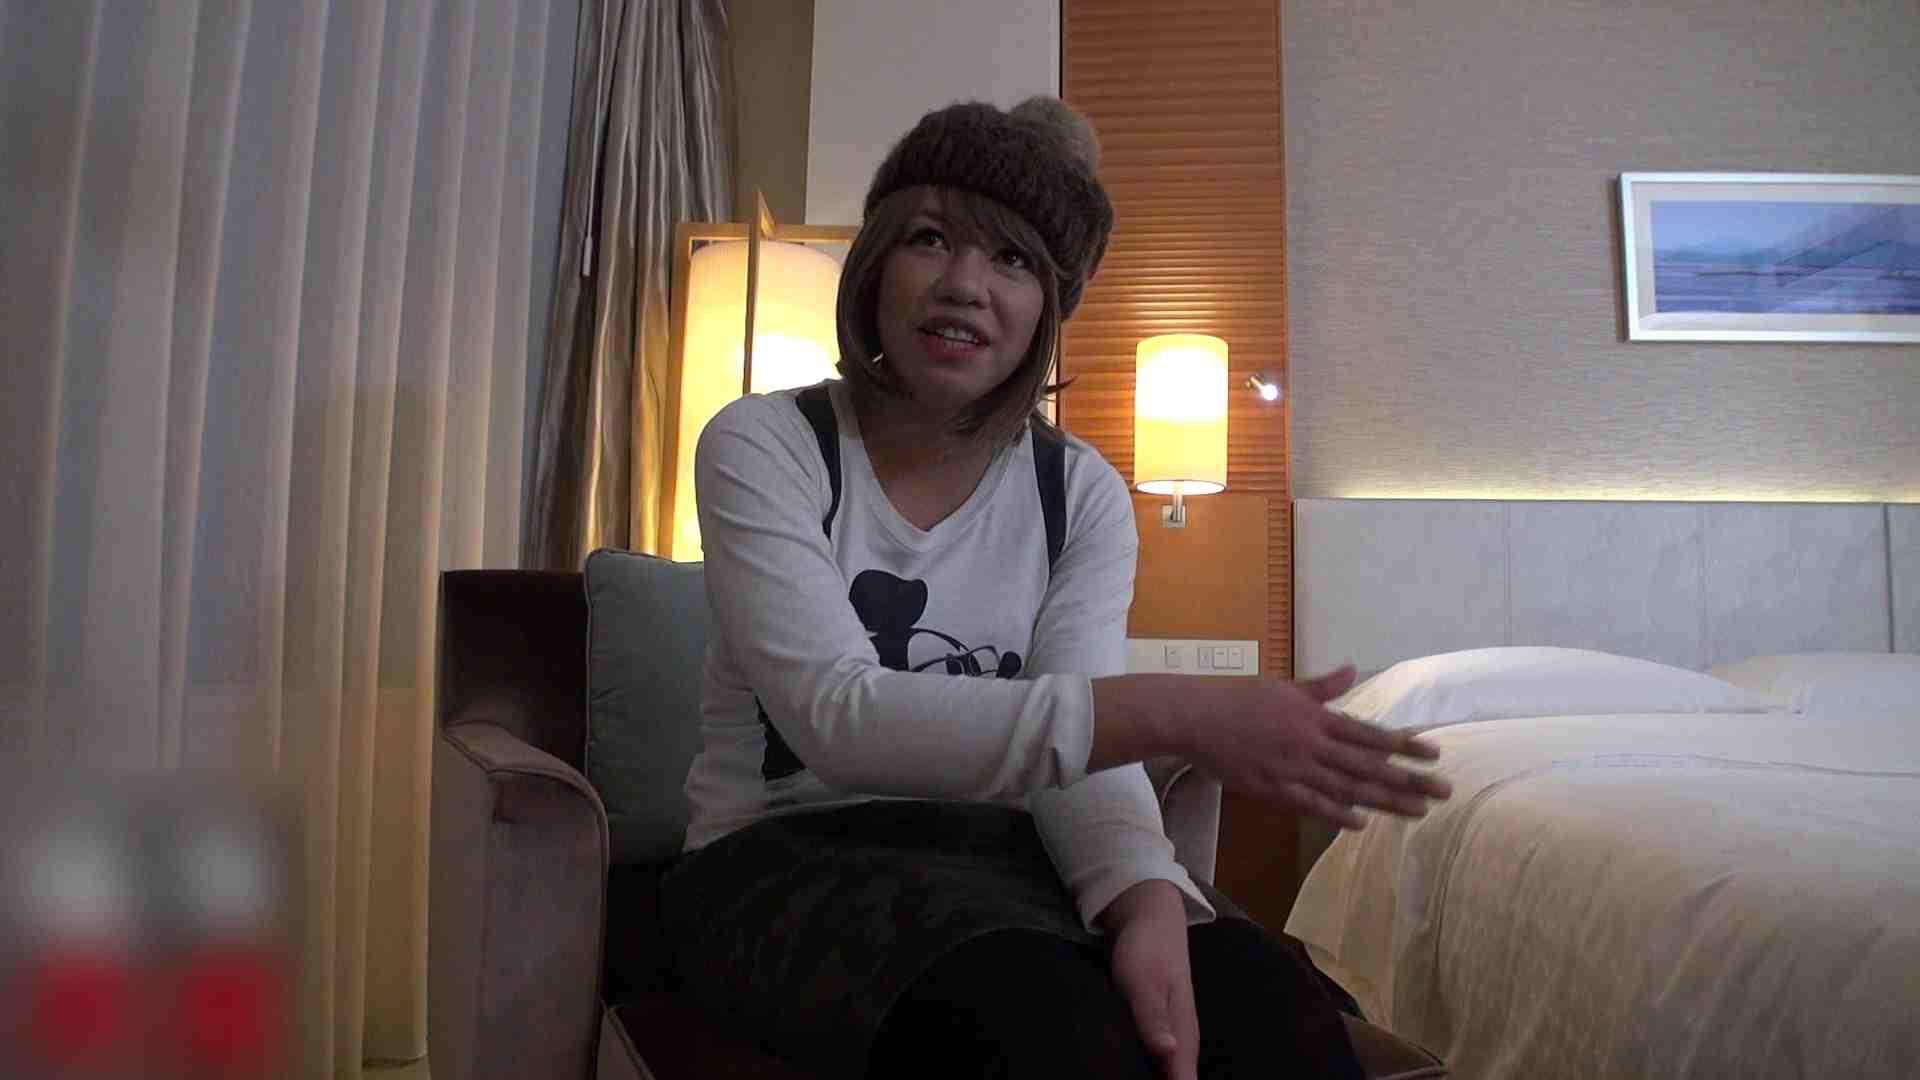 S級厳選美女ビッチガールVol.42 前編 S級美女ギャル 性交動画流出 83画像 43